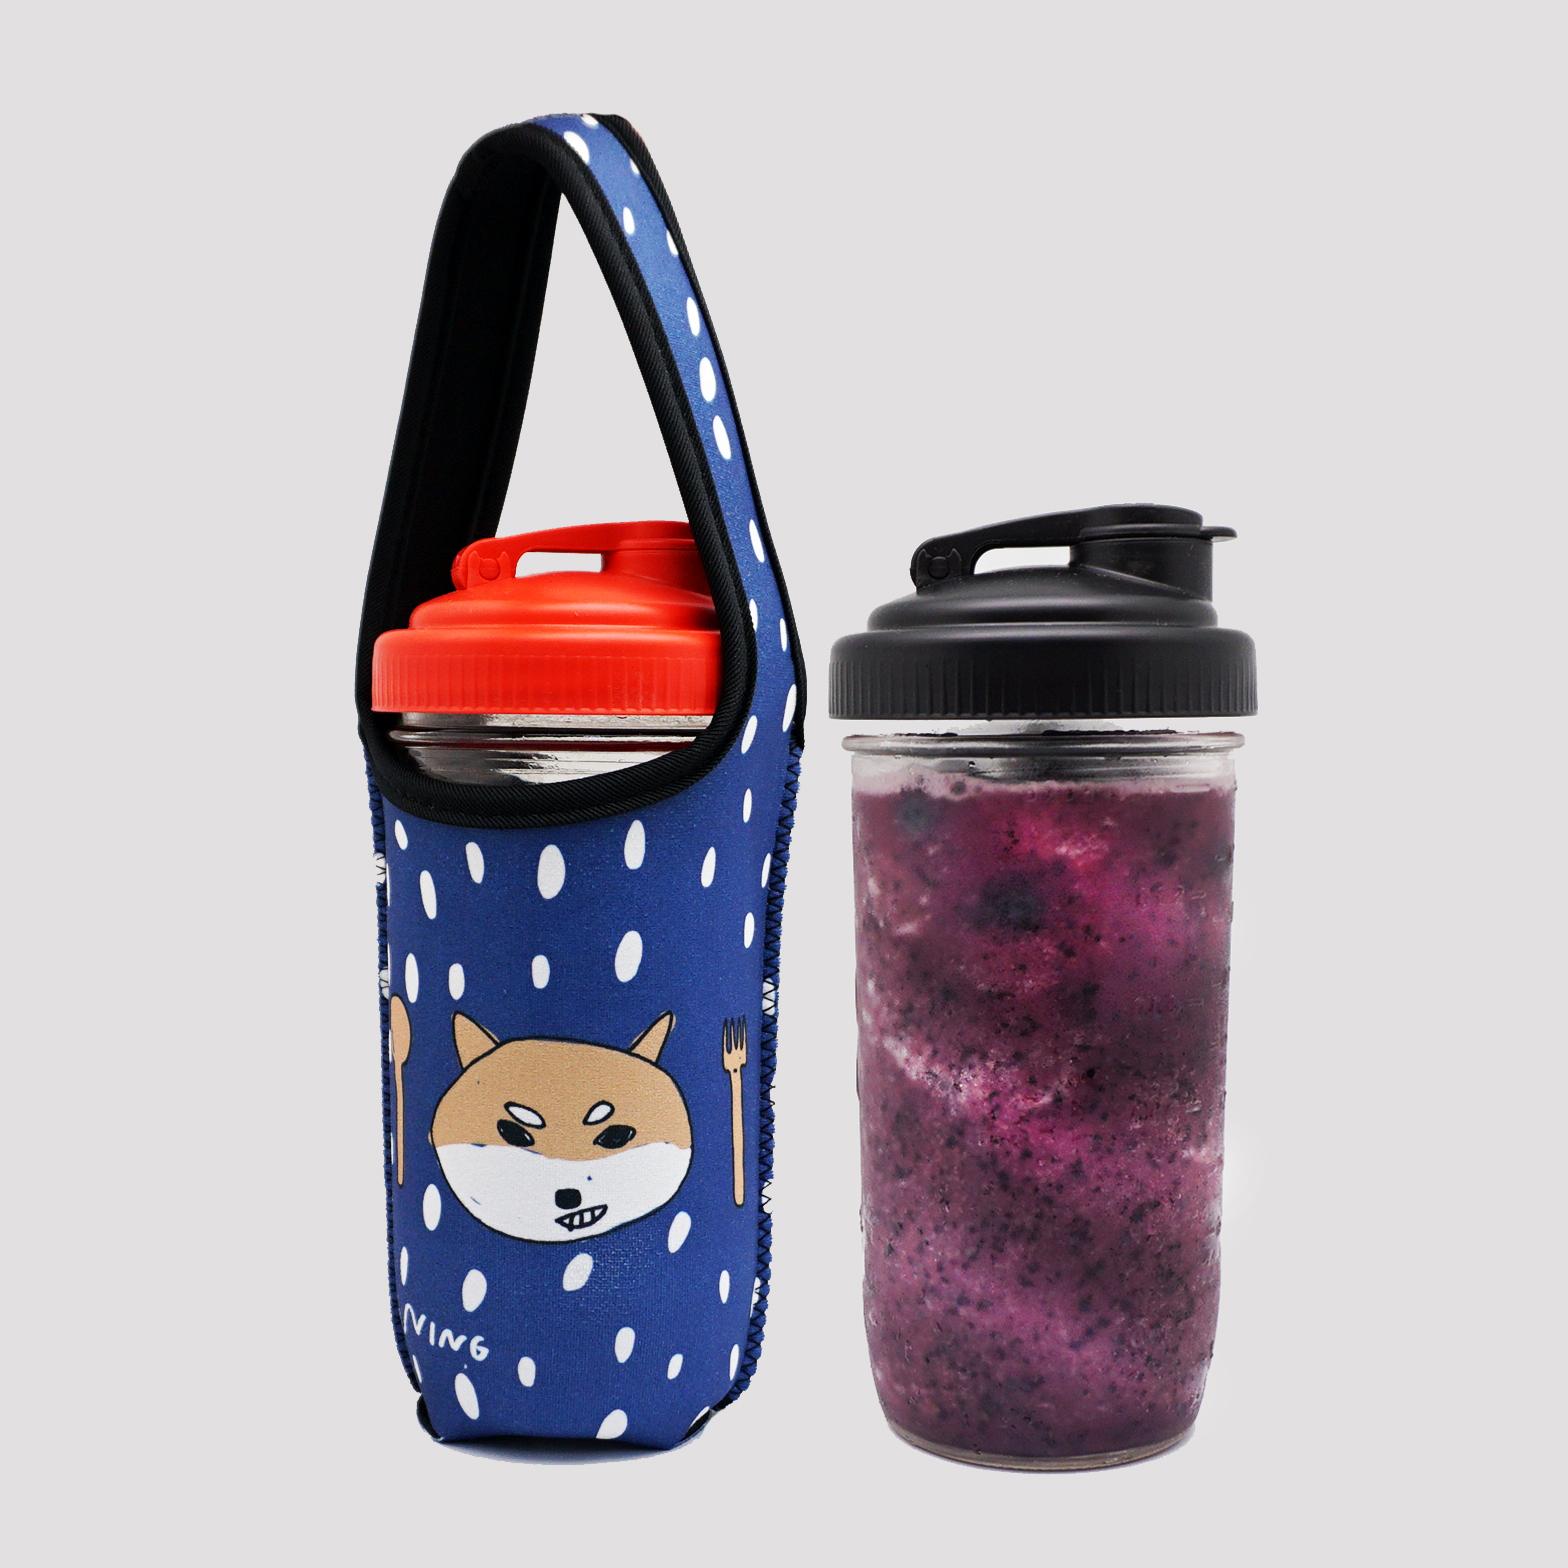 BLR 24oz梅森罐 reCAP 飲料杯袋組合 藍底柴犬